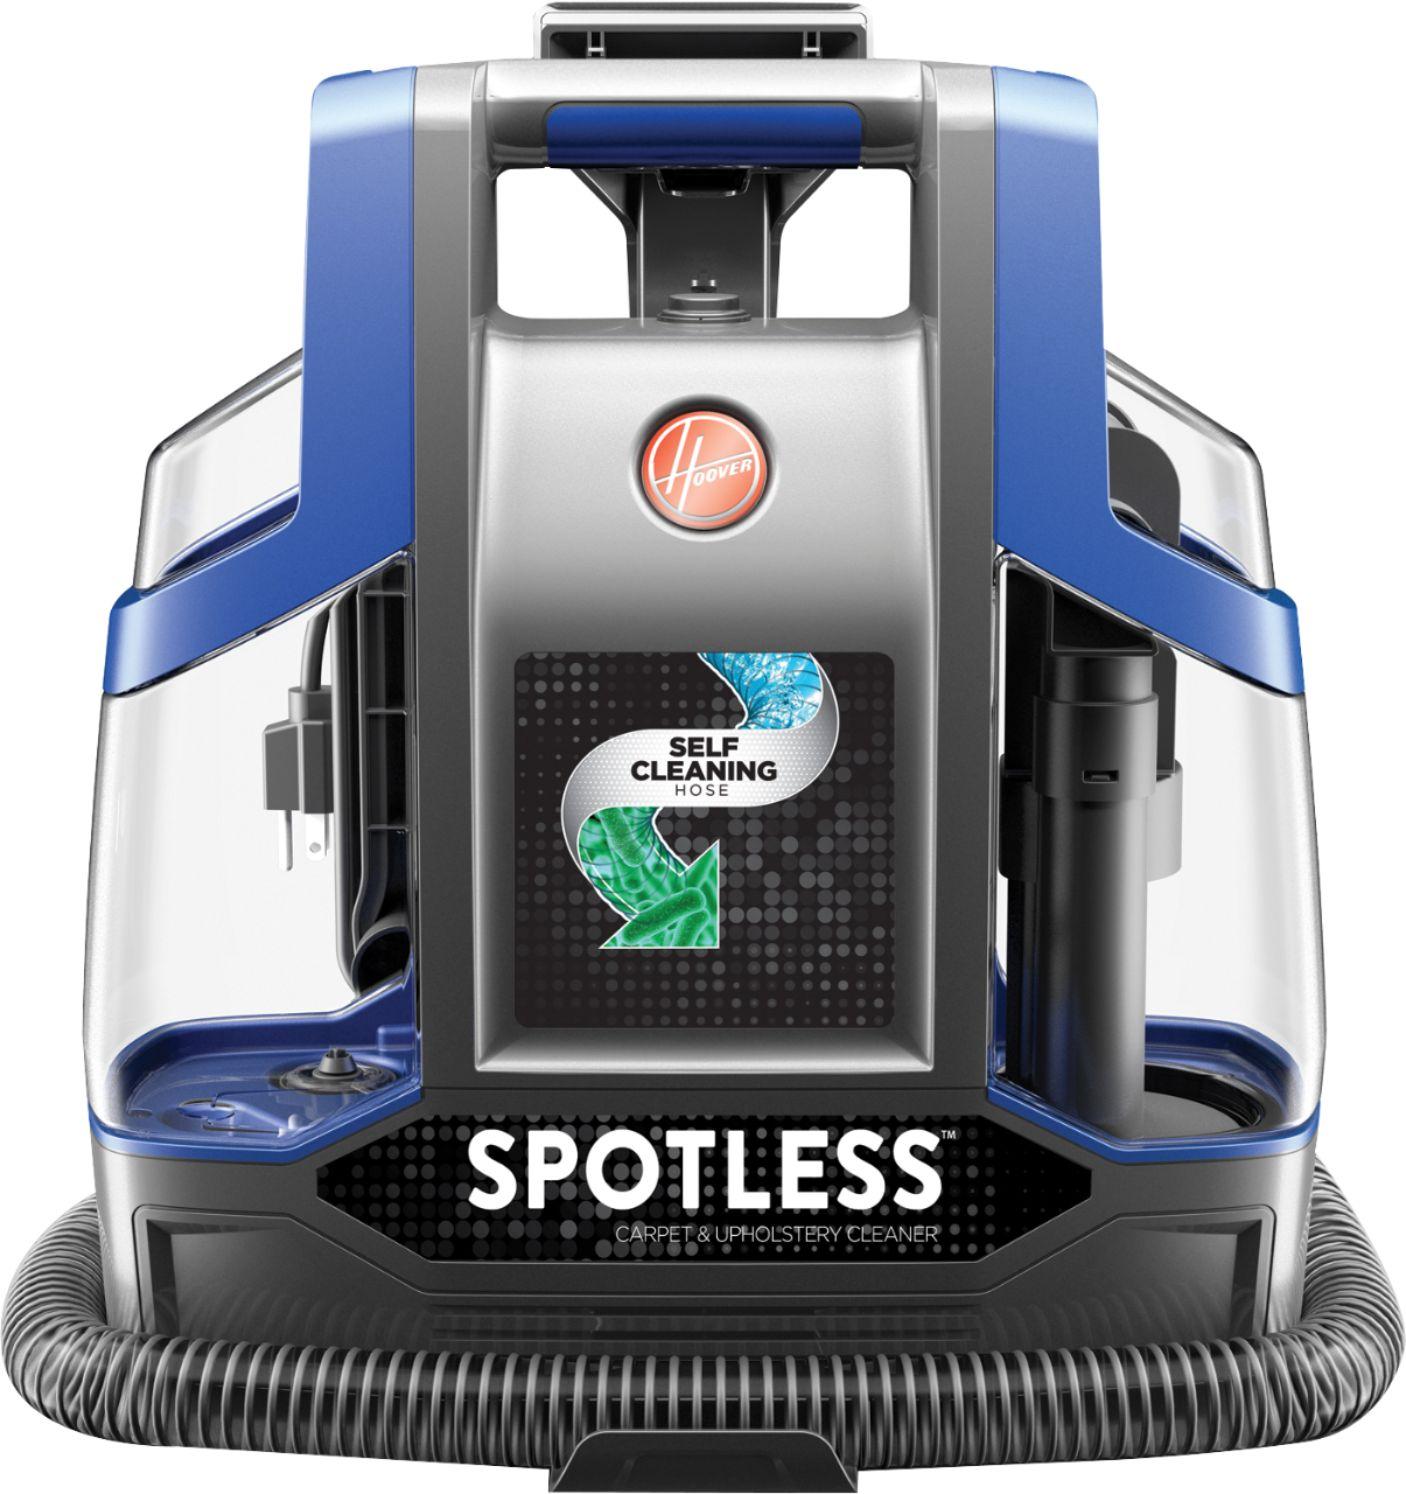 Hoover Spotless Deluxe Carpet Cleaner, Blue Spotless Deluxe